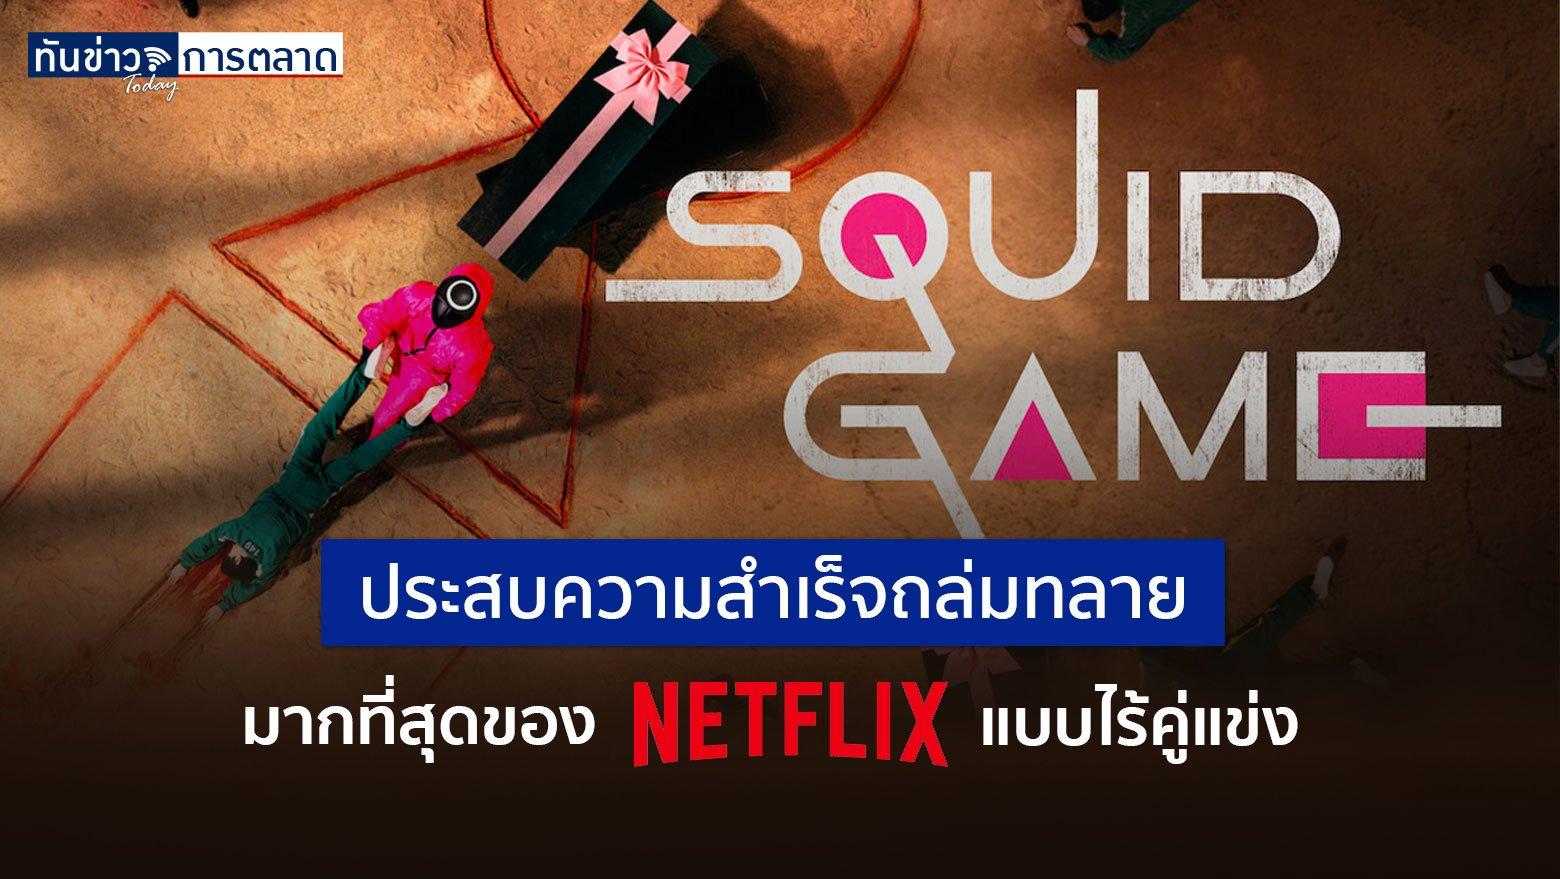 Squid Game สควิดเกม เล่นลุ้นตาย เกมทุนนิยมที่โหดร้าย ประสบความสำเร็จถล่มทลายมากที่สุดของ Netflix แบบไร้คู่แข่ง